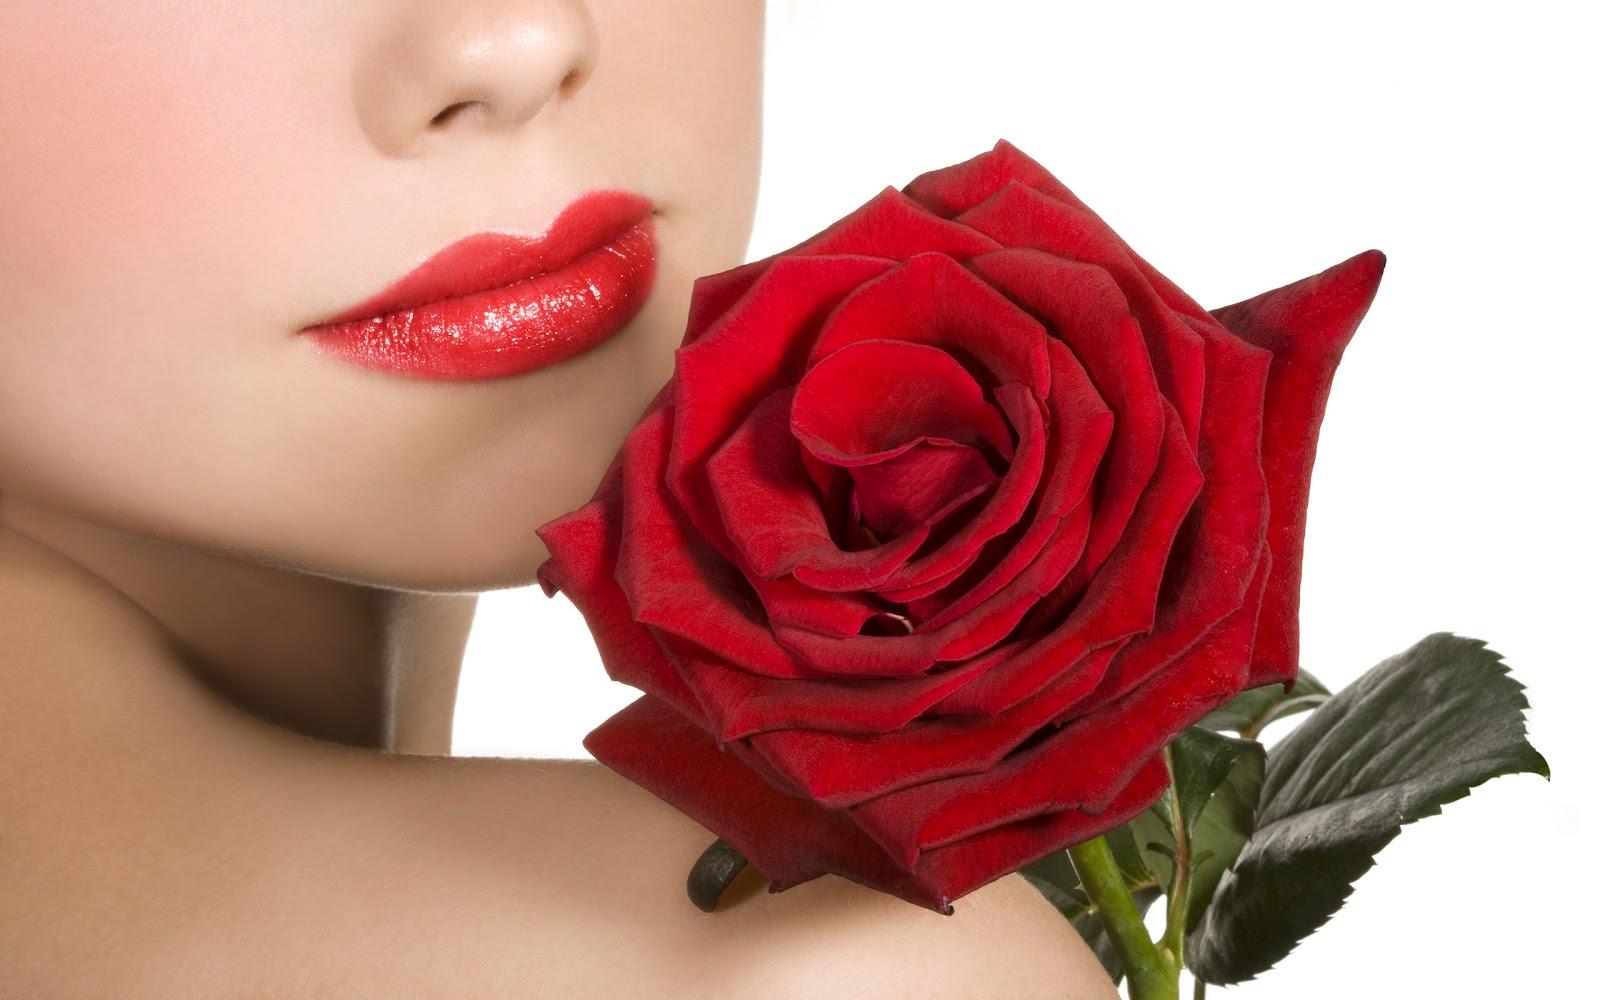 http://3.bp.blogspot.com/-XToutKAPxNM/TyxUJ2Bdo6I/AAAAAAAAAOg/9Xtp_rg3JEY/s1600/valentine%27s+day+gift+for+women+HD+desktop+wallpaper.jpg